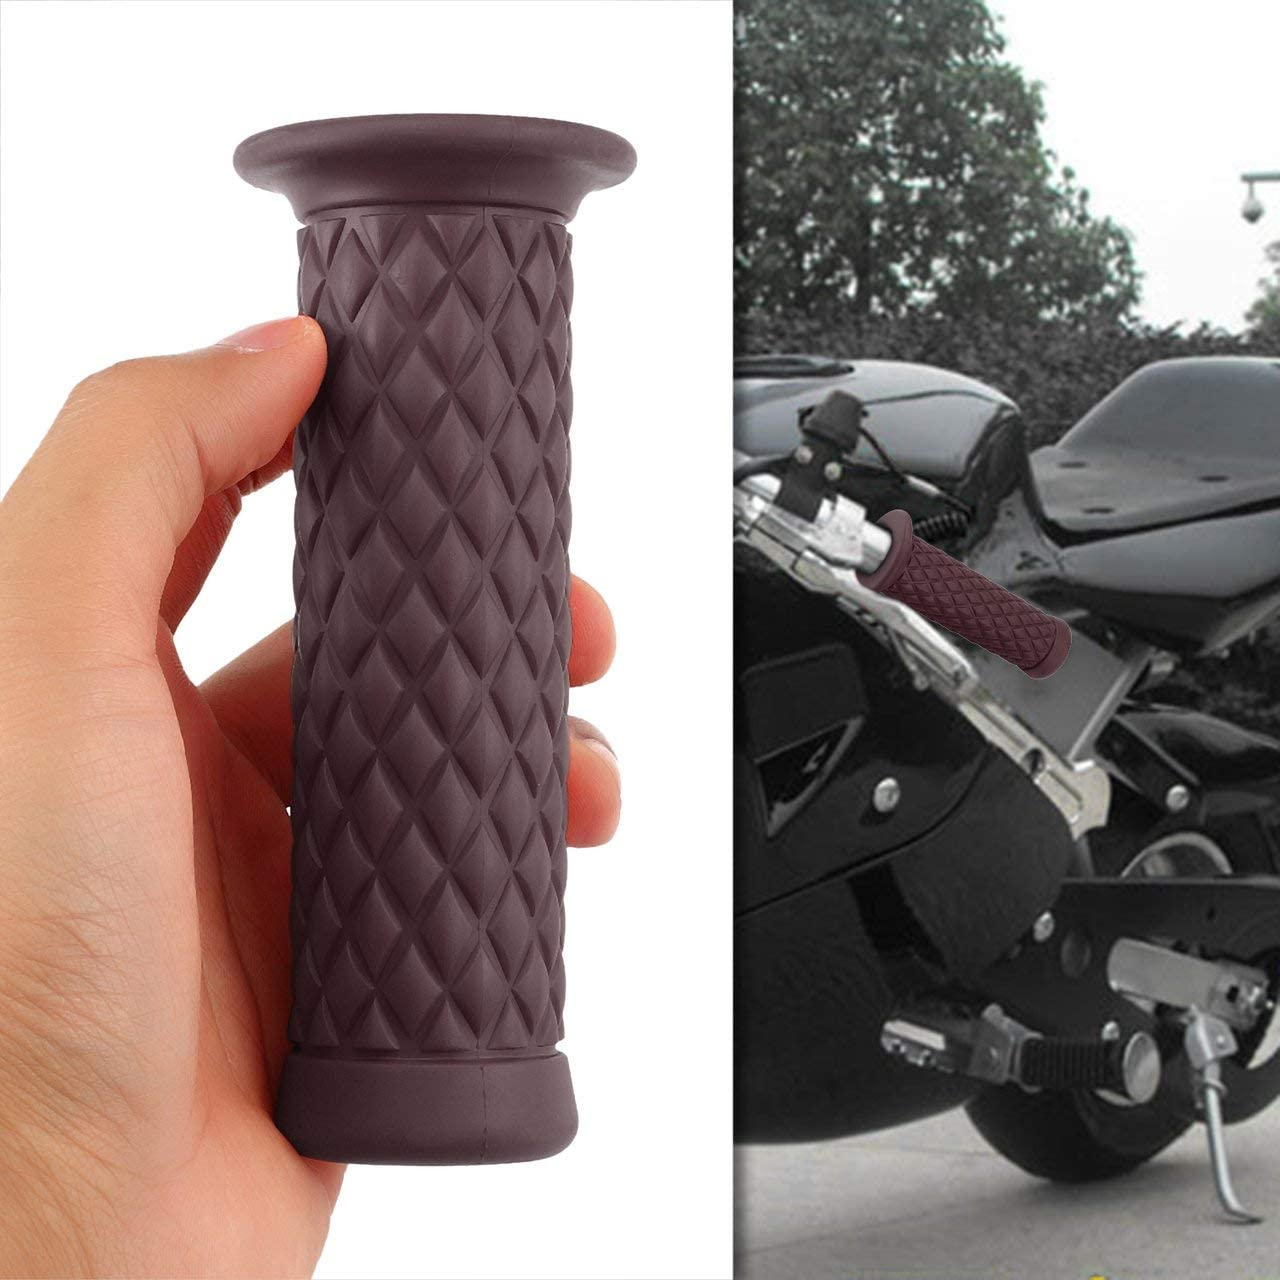 1 Para 22mm Universal Motorrad Handgriffe Rutschfeste Sport Gummi Lenker Griff Bar Ende Motorrad Bike Cafe Racer DEjasnyfall braun